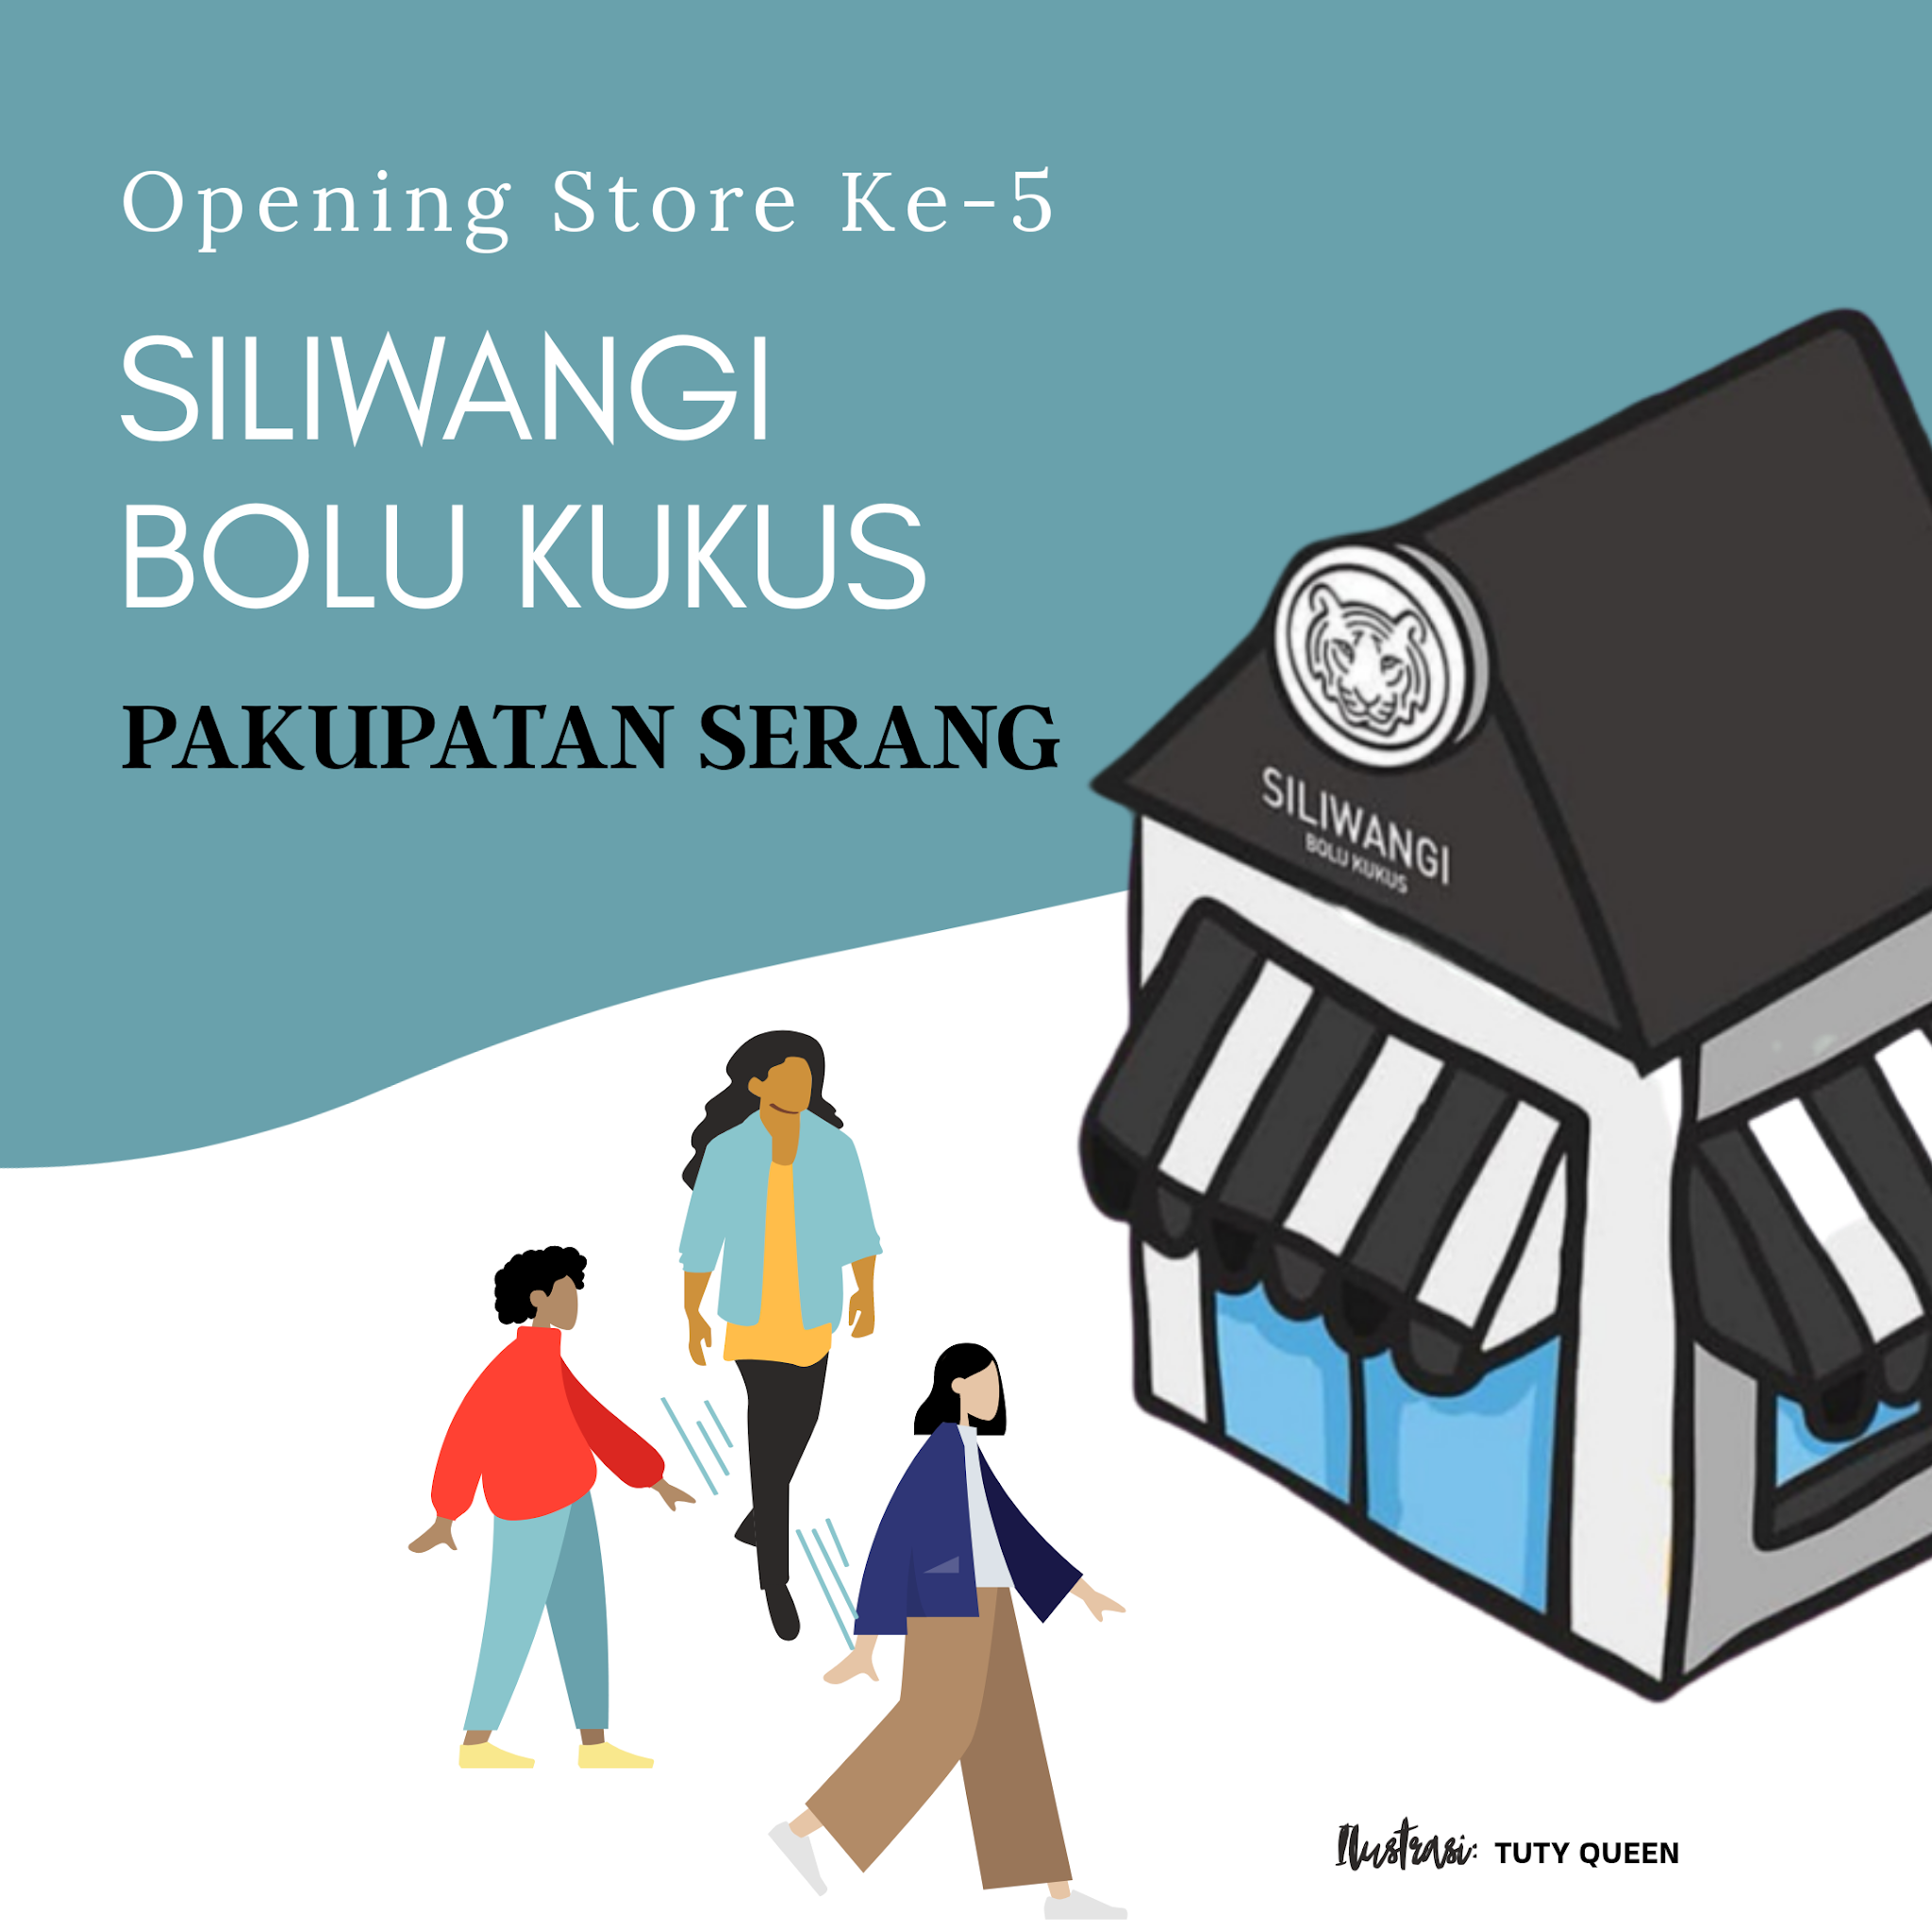 Opening Store ke 5